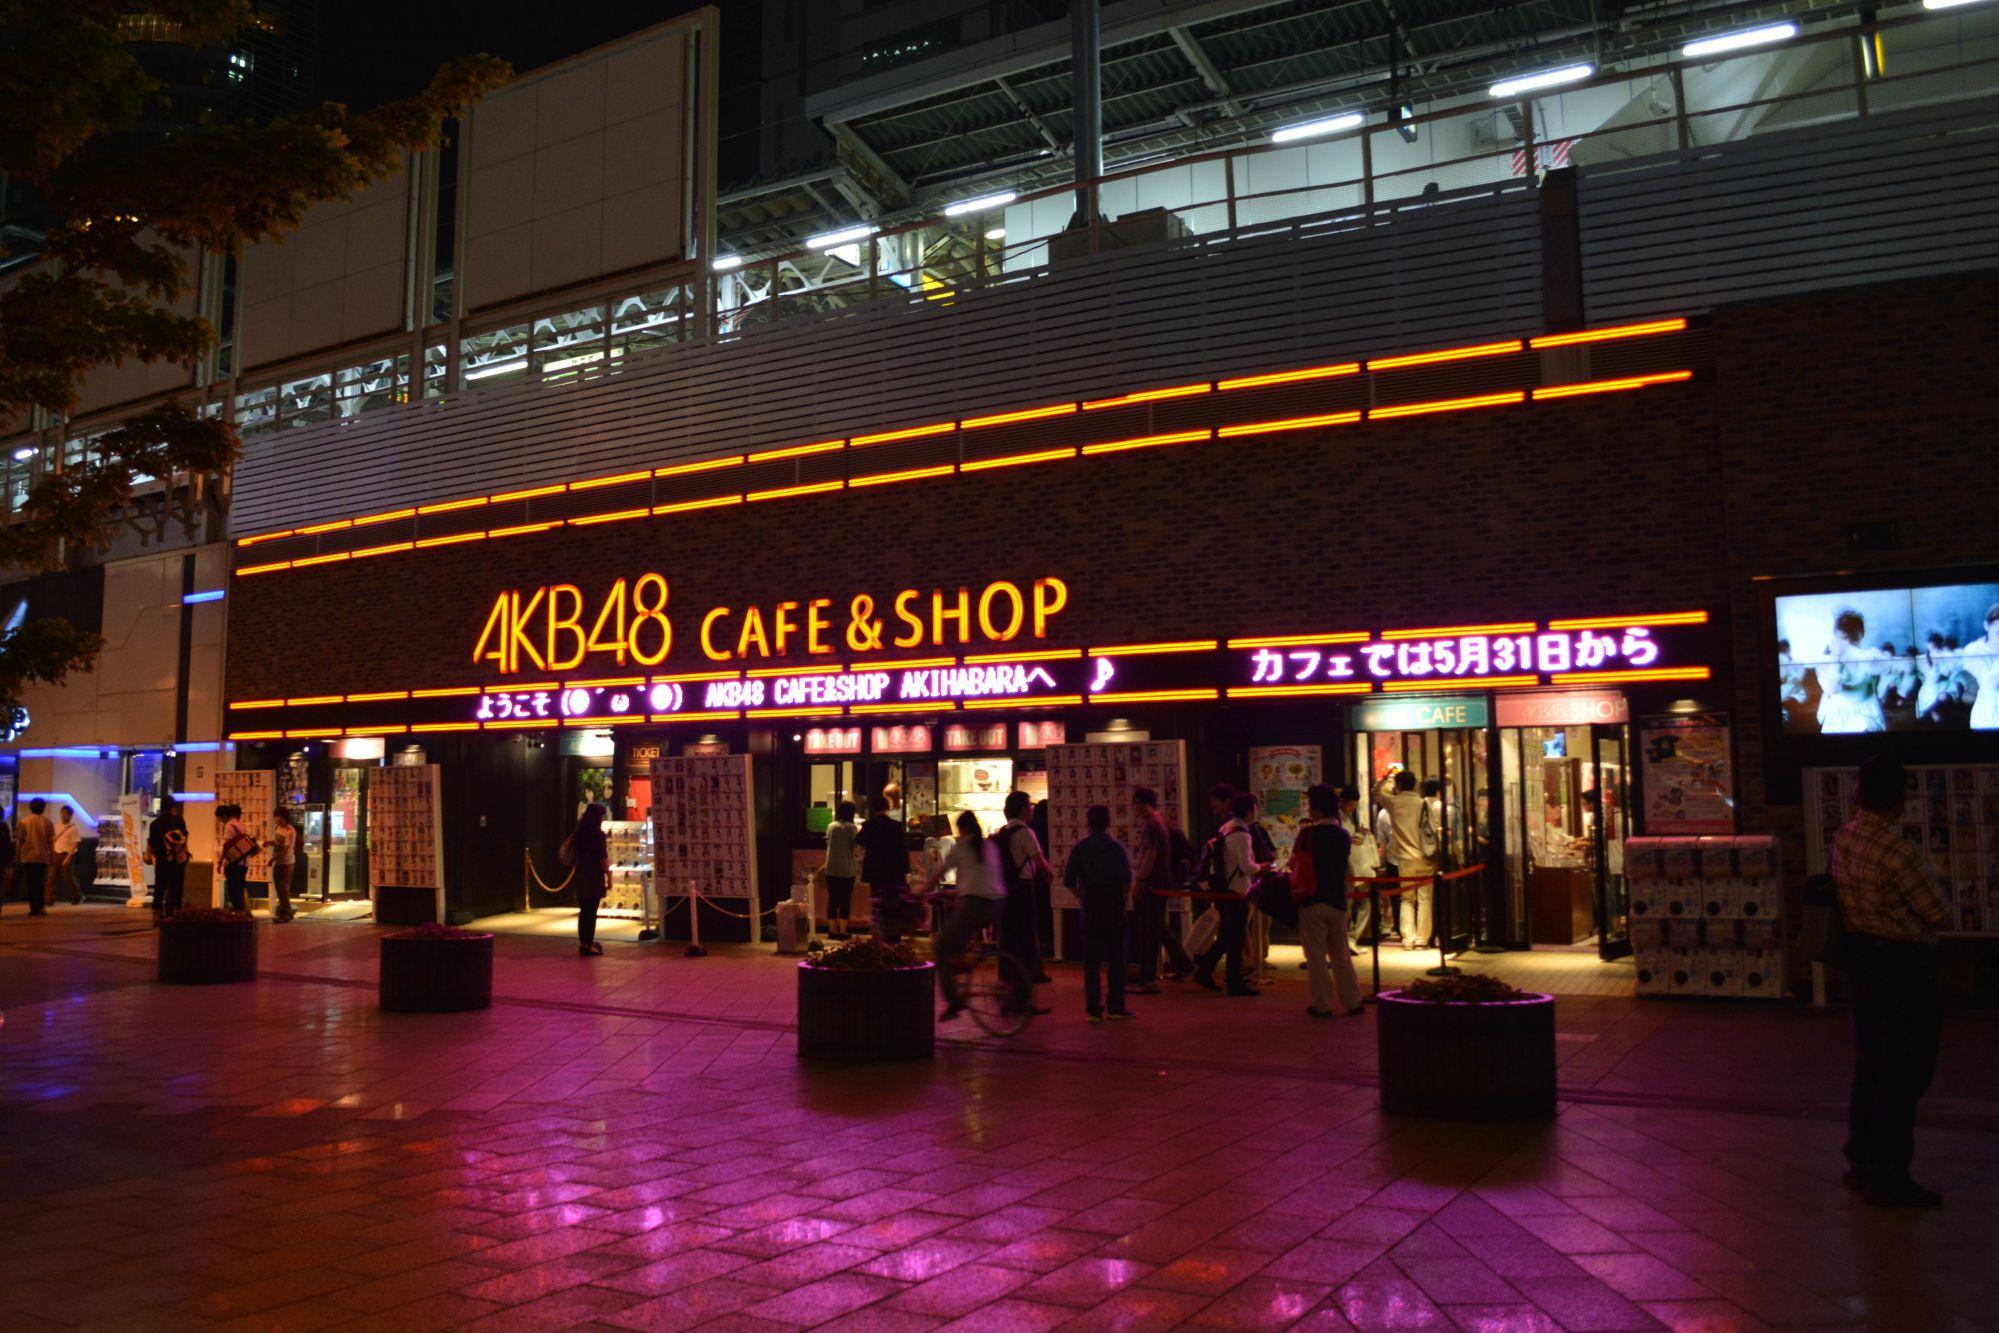 「AKB48 CAFE&SHOP AKIHABARA」の画像検索結果